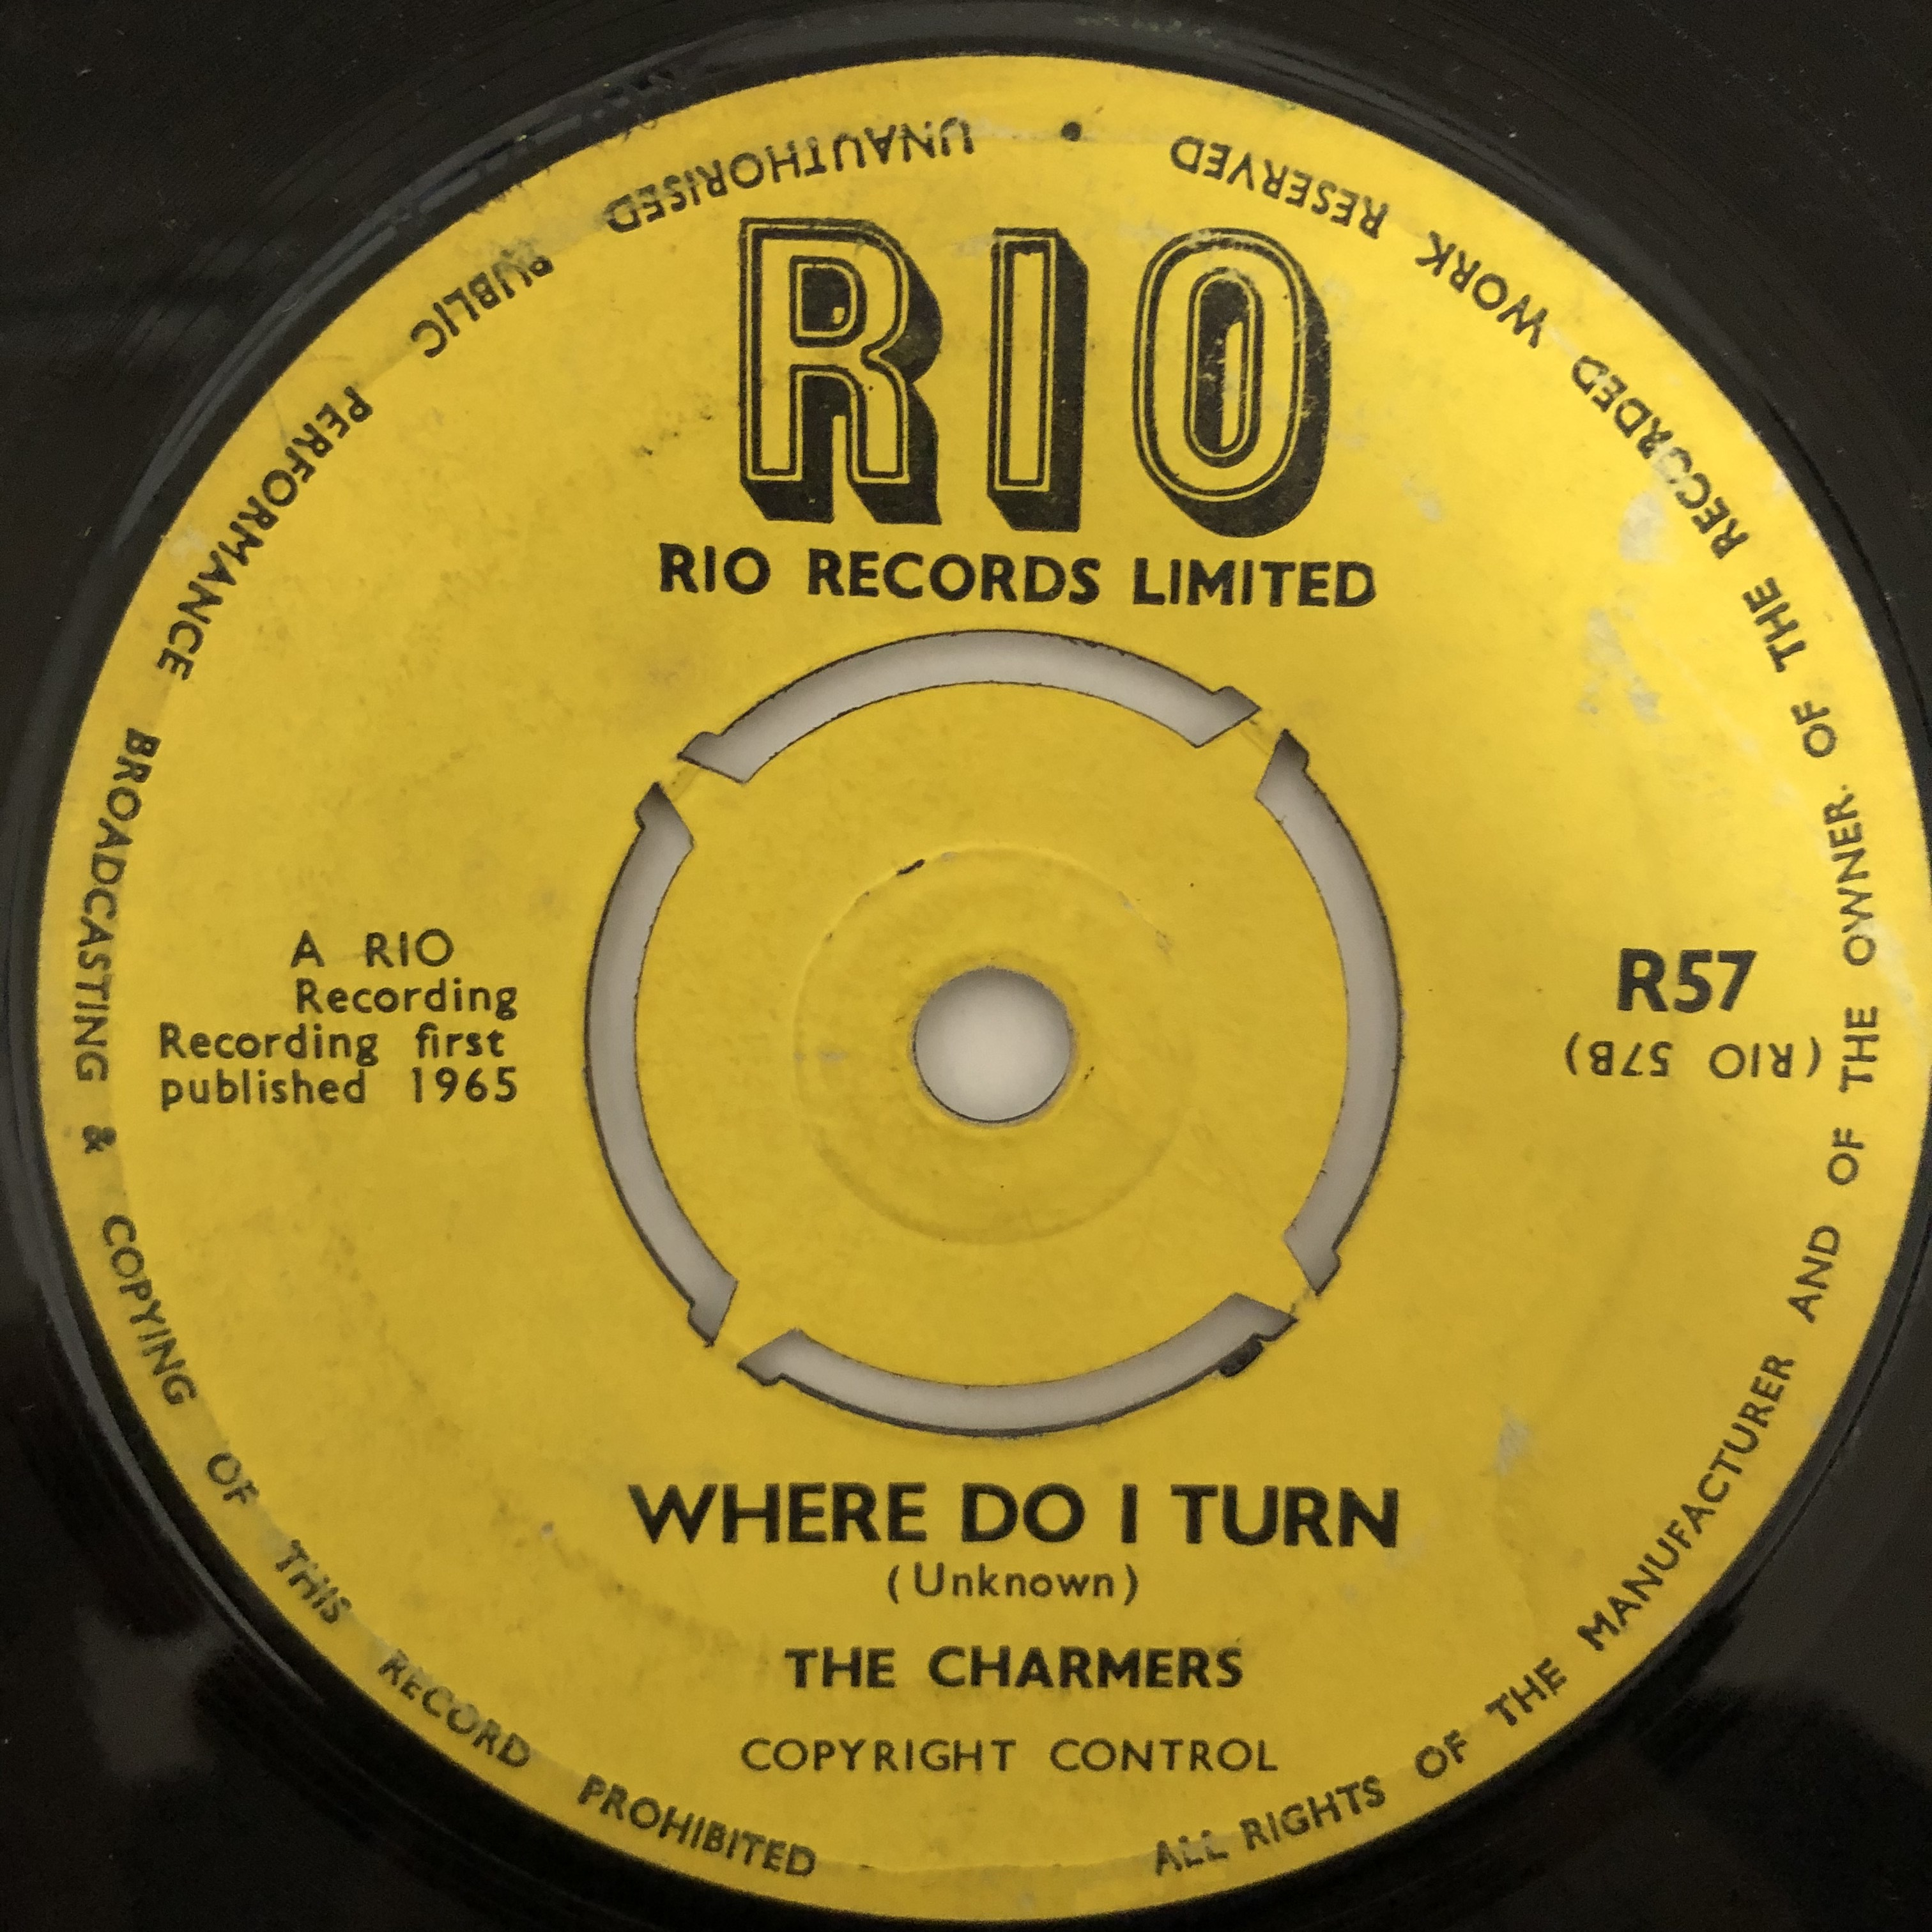 The Charmers - Where Do I Turn【7-20483】